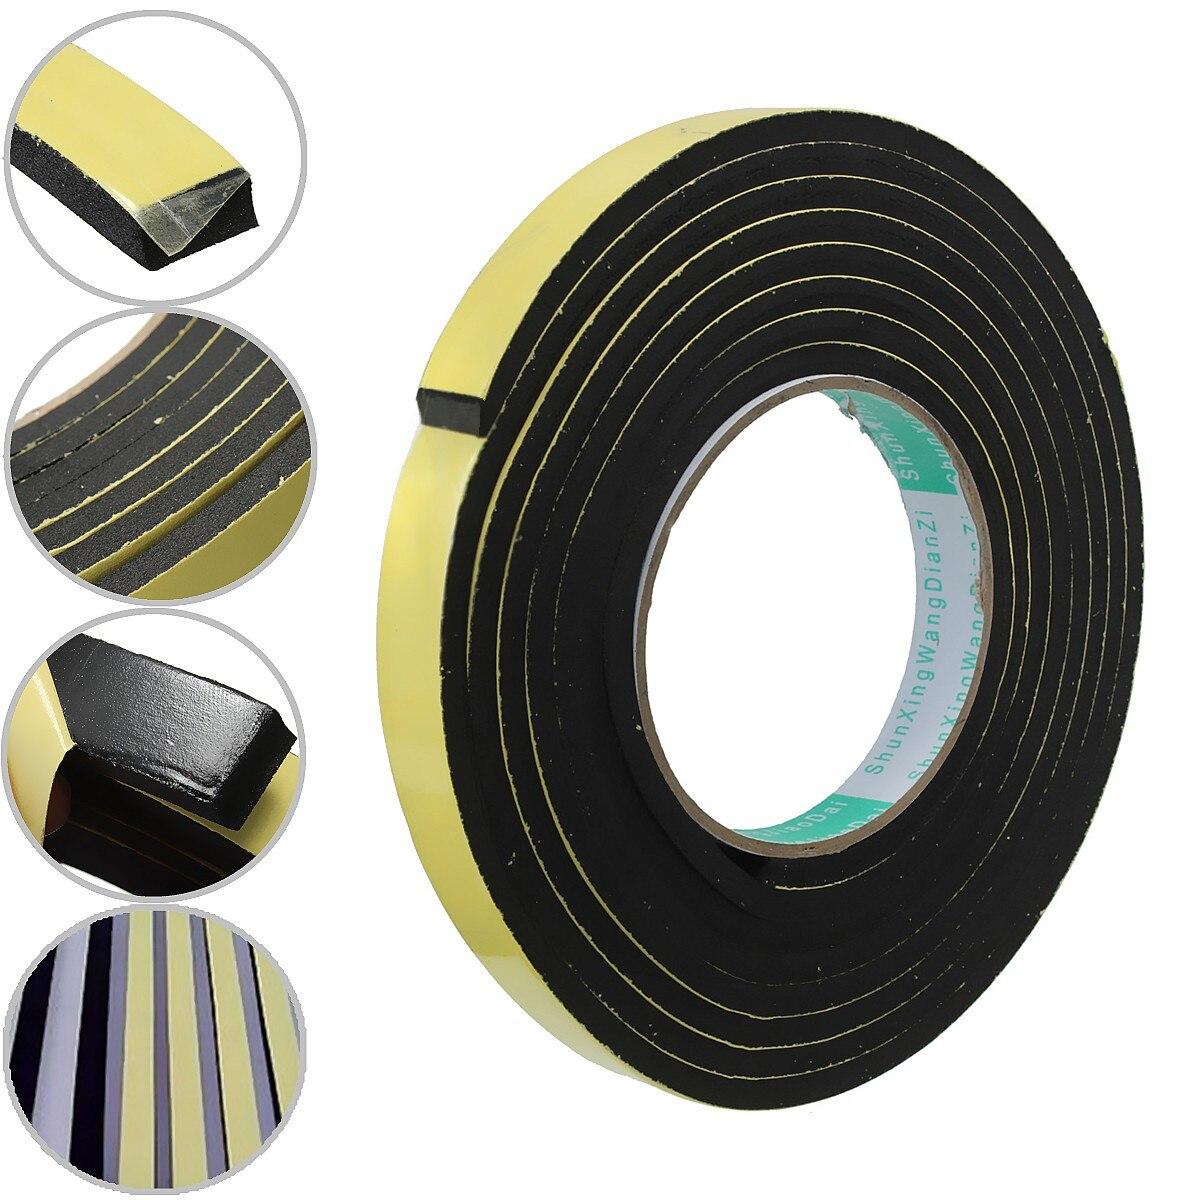 2Mx15mm Door Sealing Tape Sticky Stripping Sponge Foam Tape Rubber Single Sided Adhesive EVA Foam Tape Window Seal Strips2Mx15mm Door Sealing Tape Sticky Stripping Sponge Foam Tape Rubber Single Sided Adhesive EVA Foam Tape Window Seal Strips